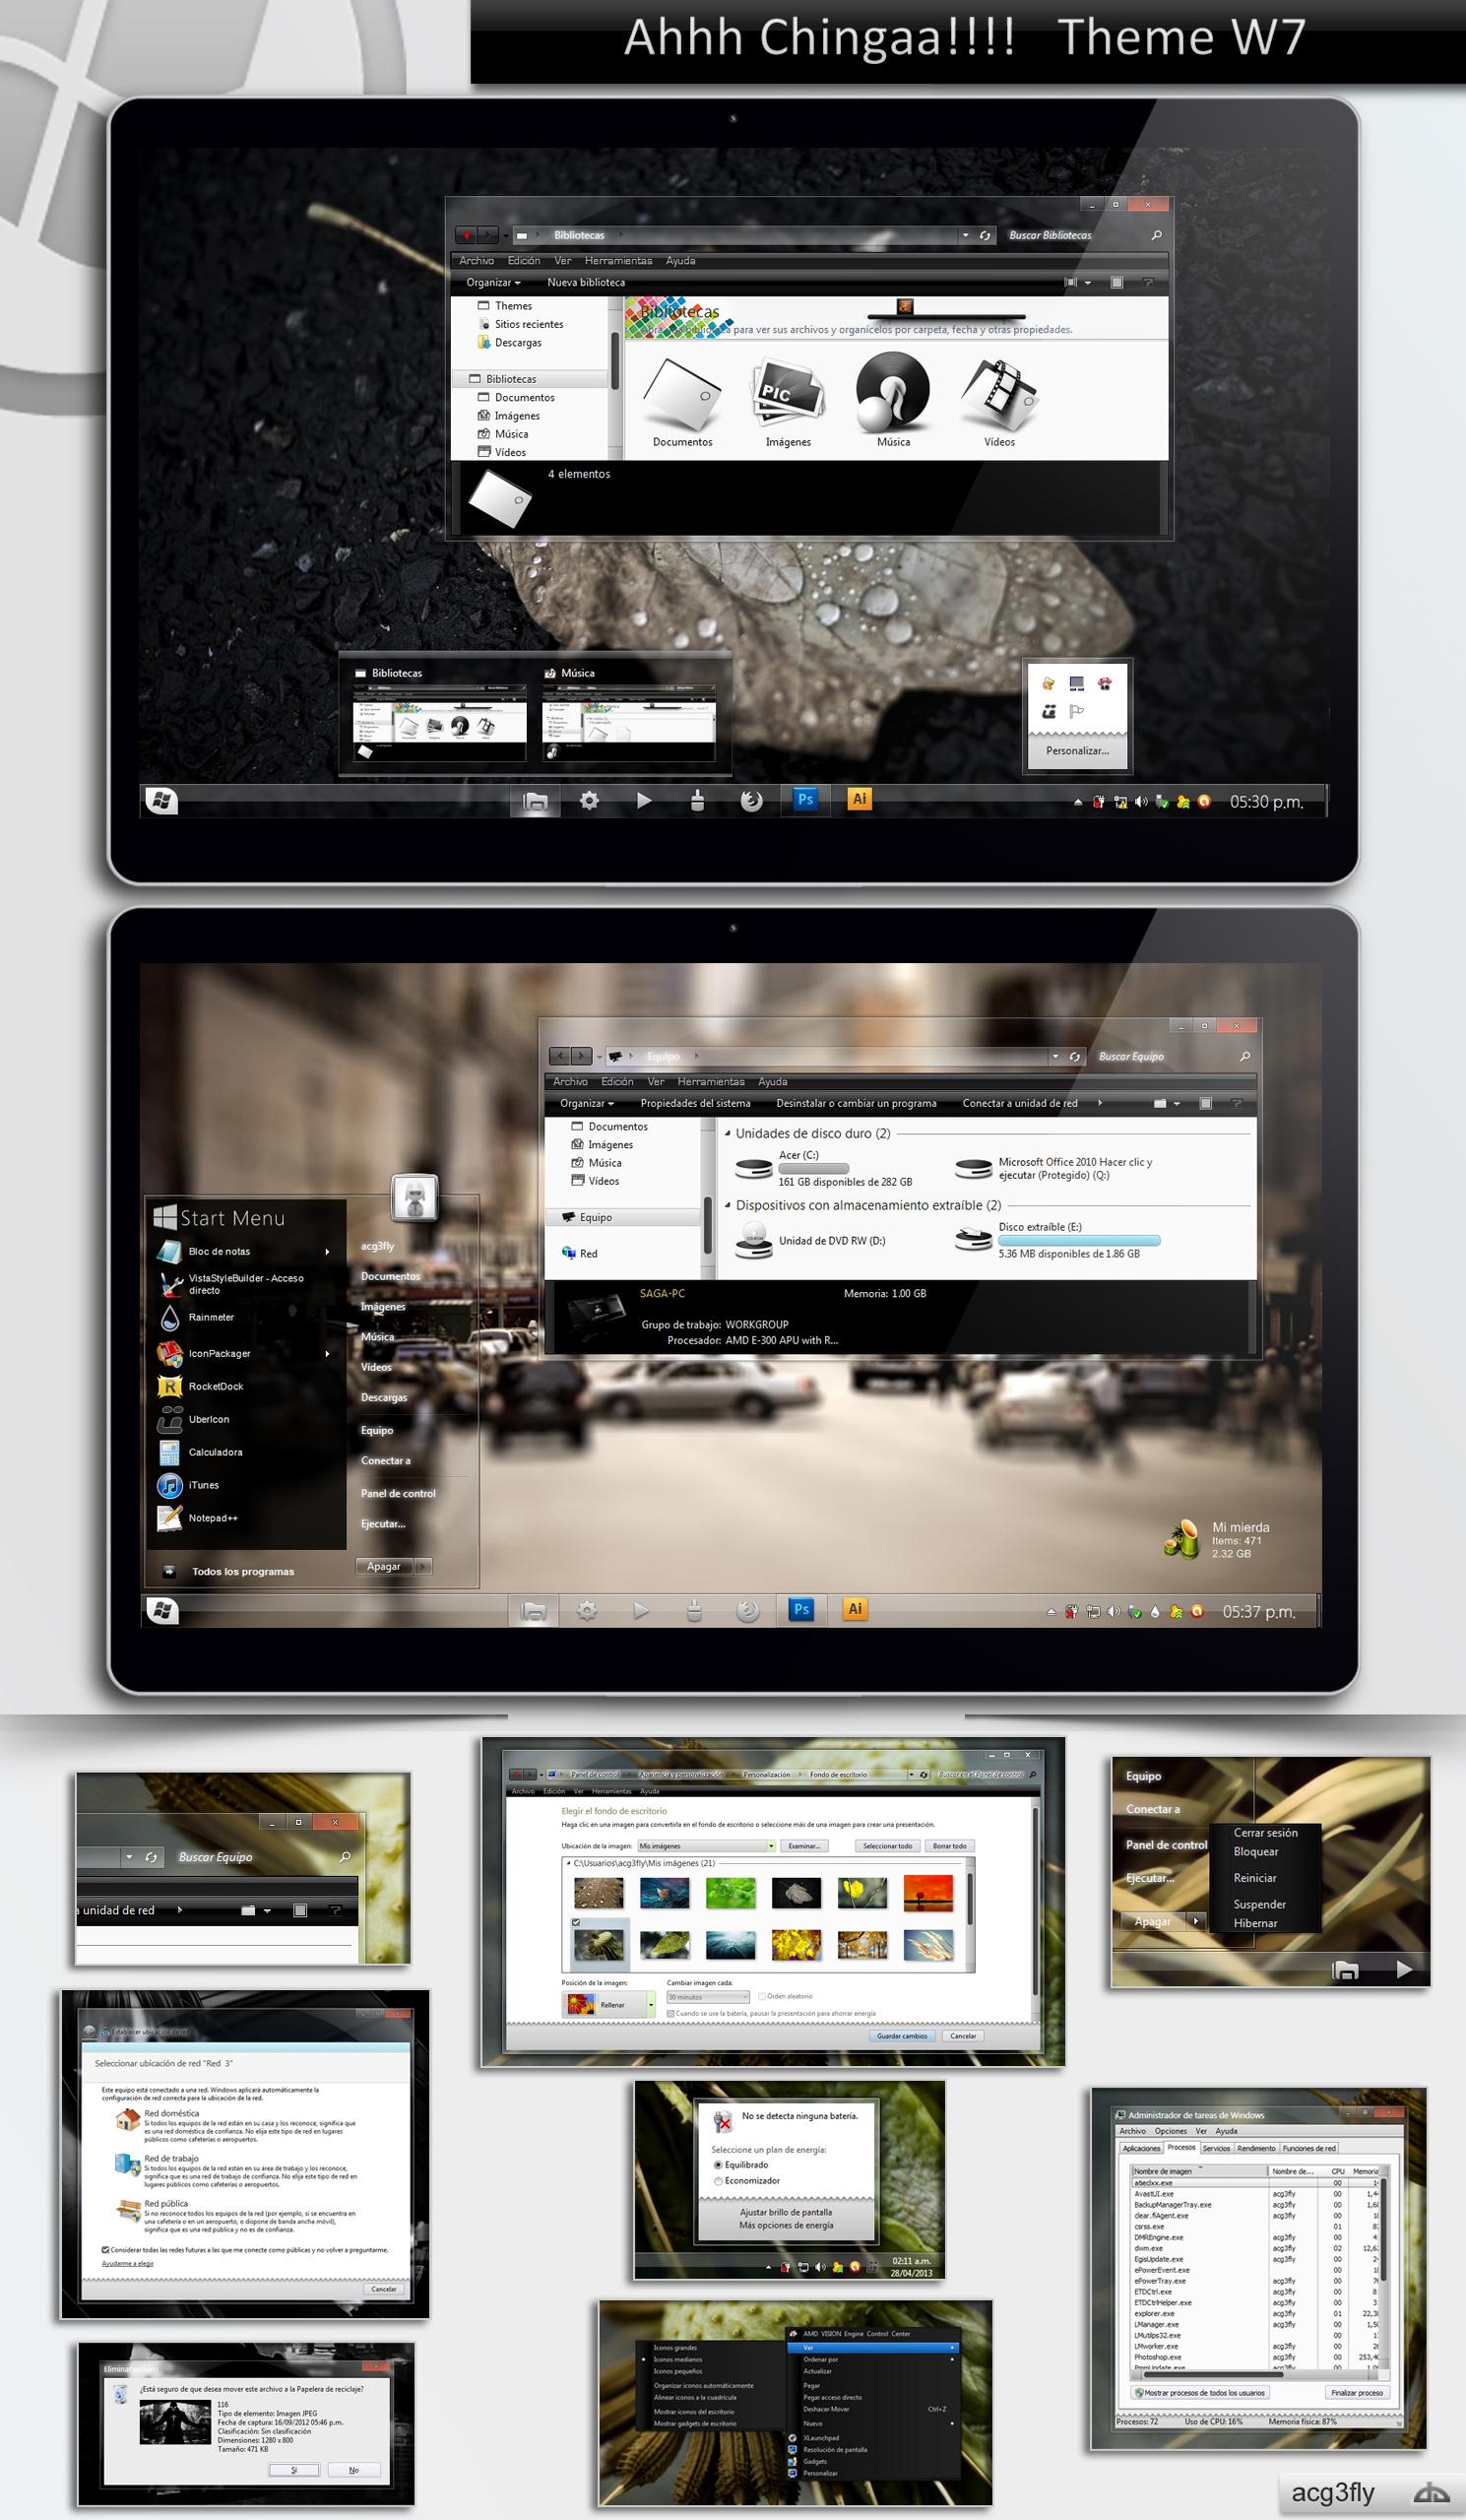 Theme Windows7 Ahhh Chingaa!! (last updated 9/Mar) by acg3fly